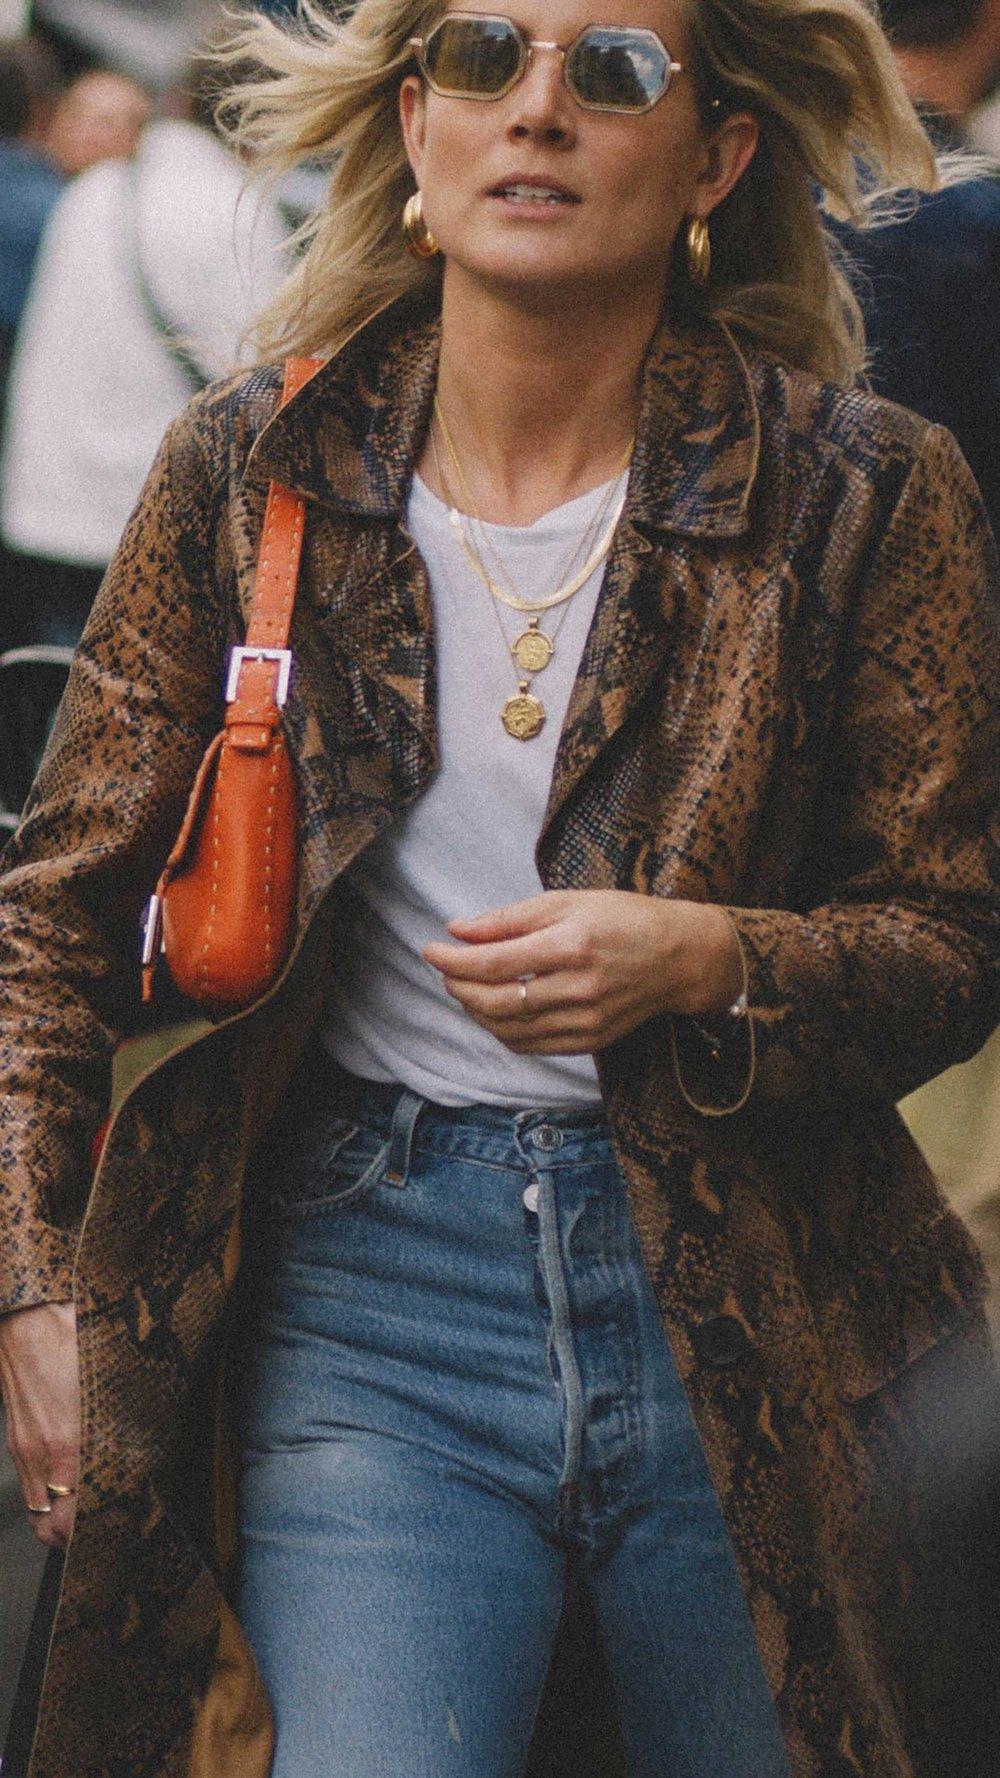 11 ways to wear snake print, snake print coat and gold jewelry street style paris.jpg